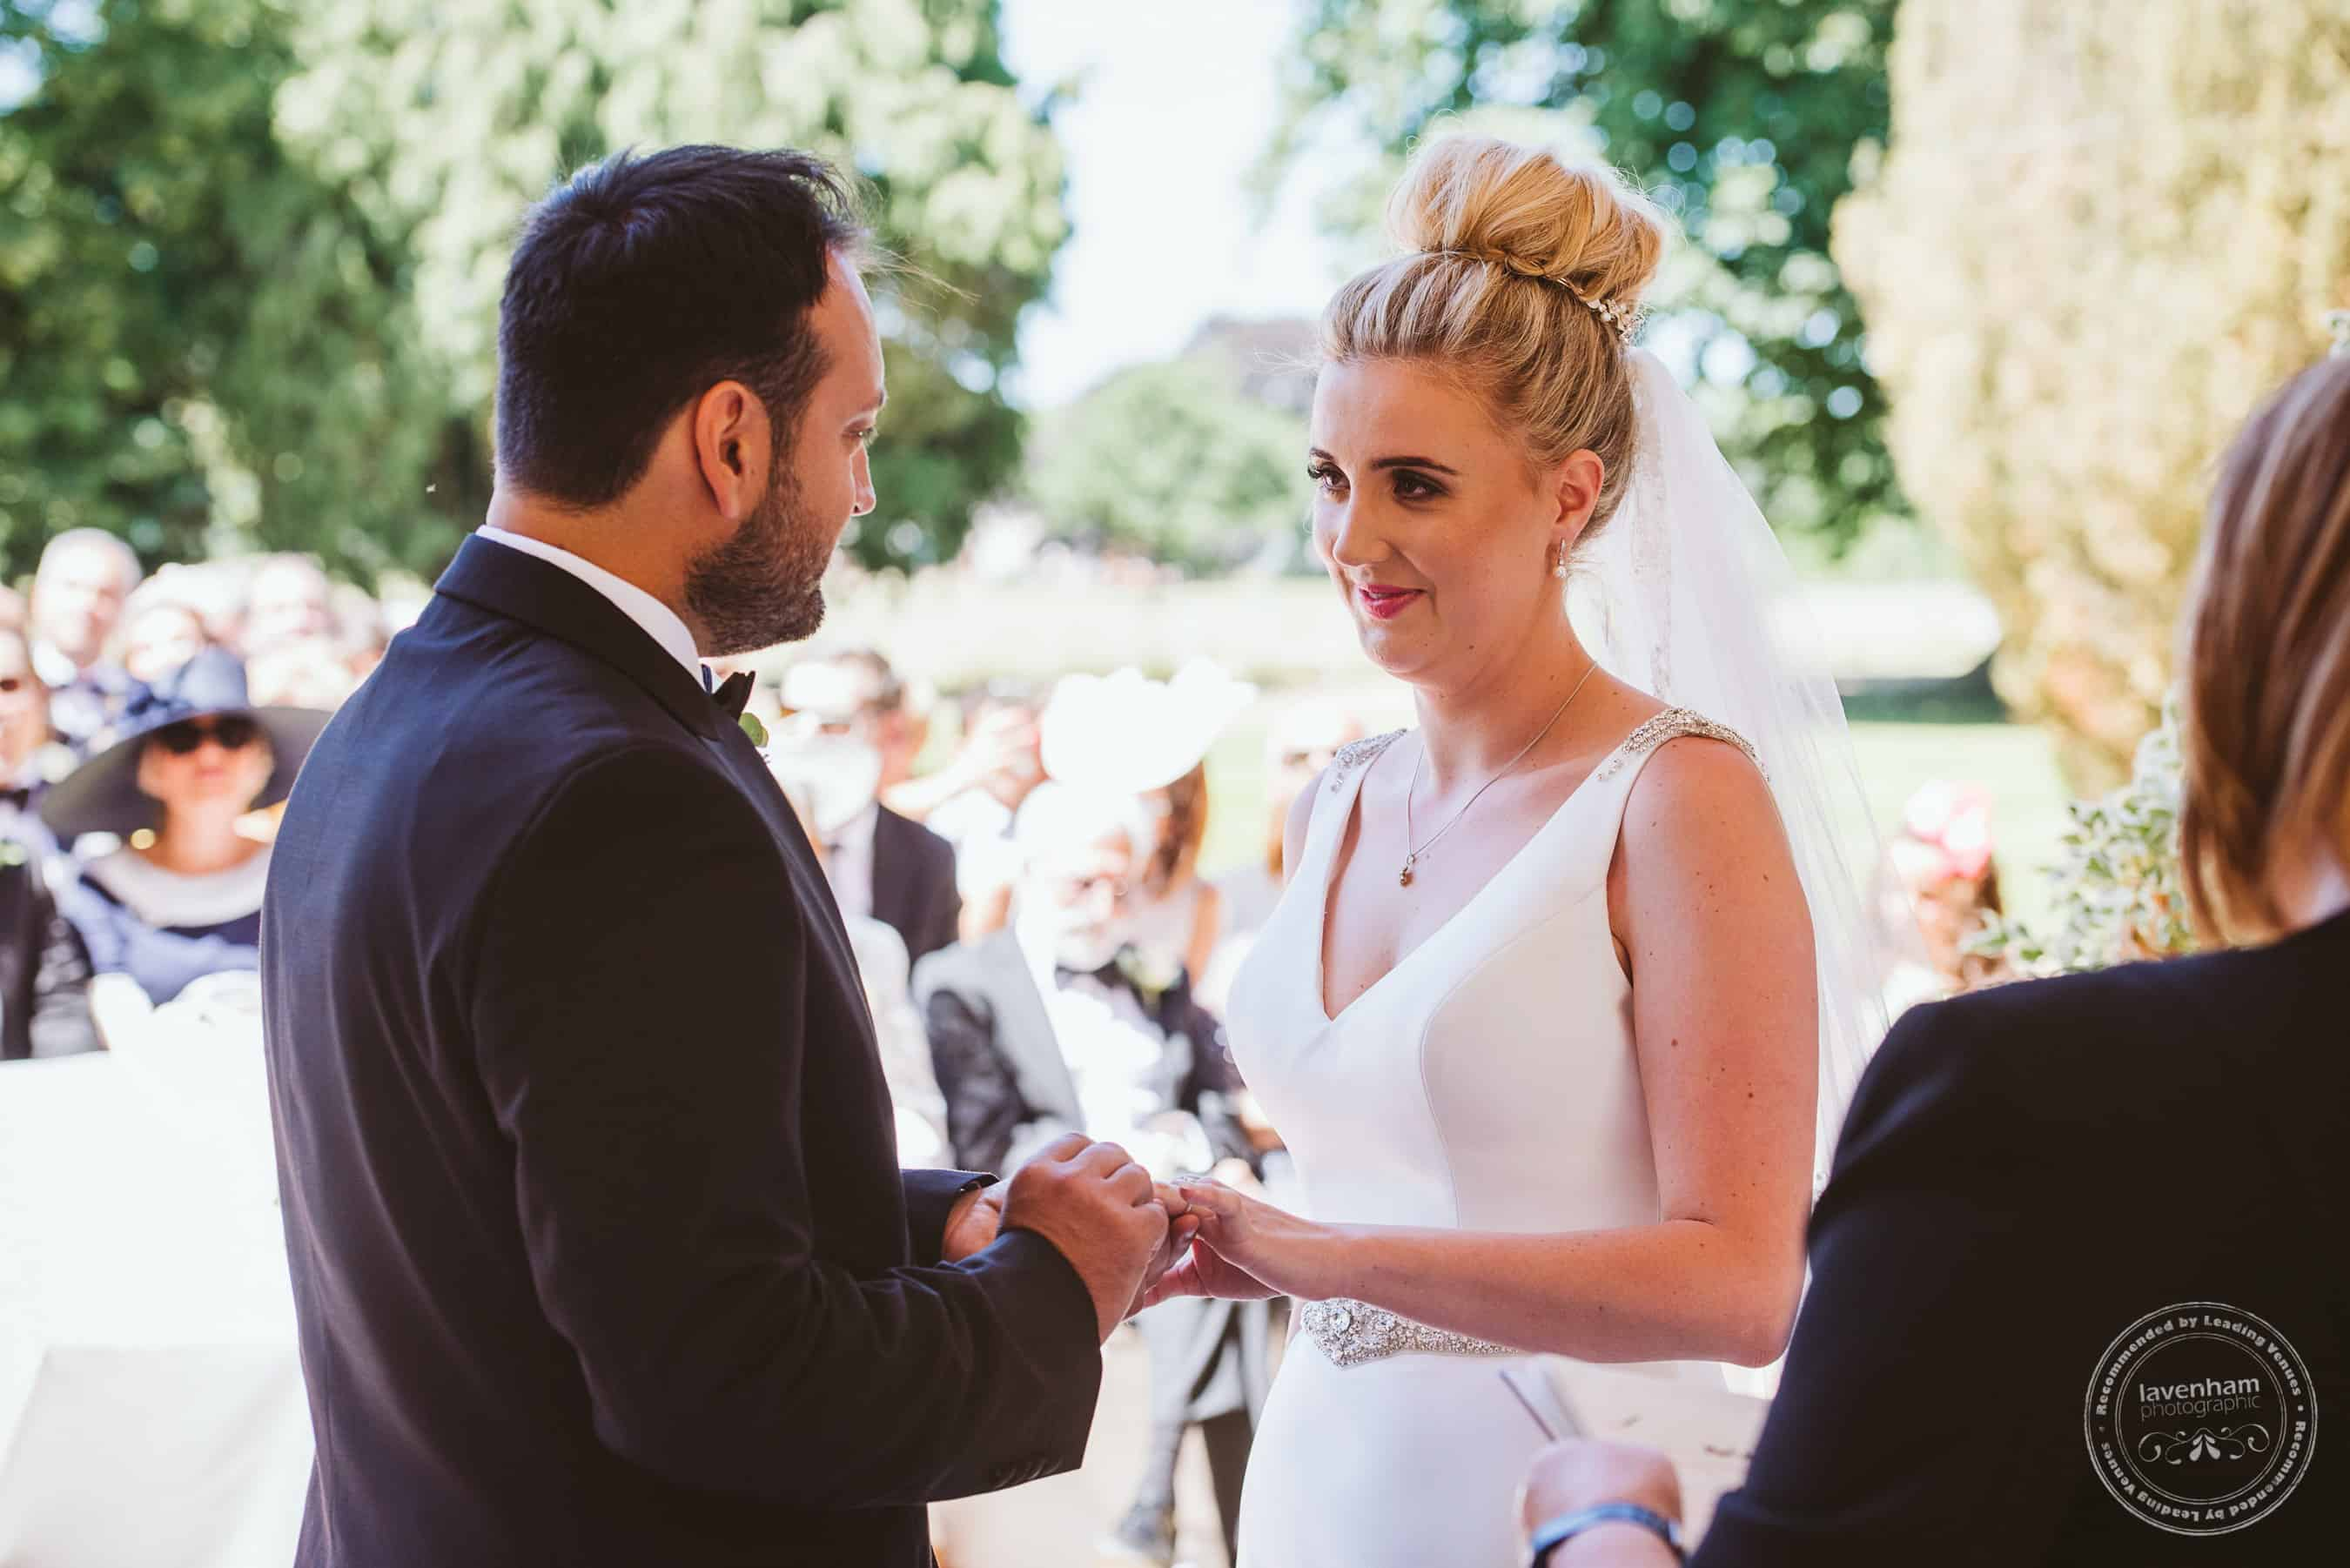 220618 Gosfield Hall Wedding Photography Lavenham Photographic 0080